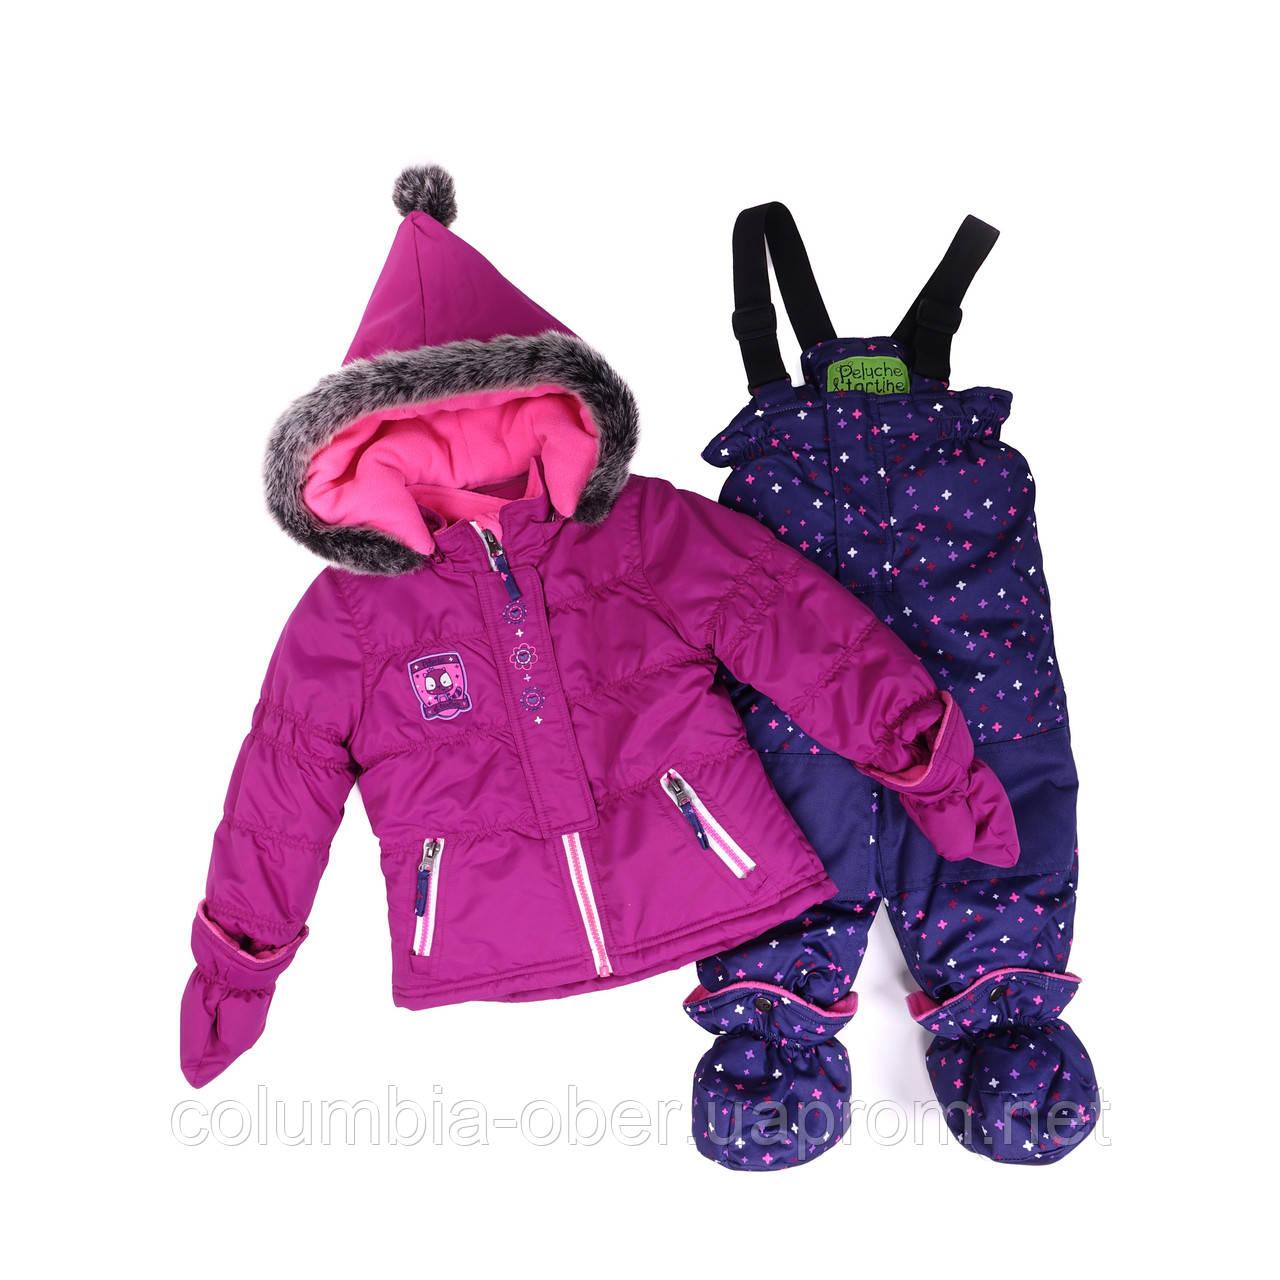 Зимний костюм для девочки PELUCHE 18 BF M F16. Размеры 82 и 89.